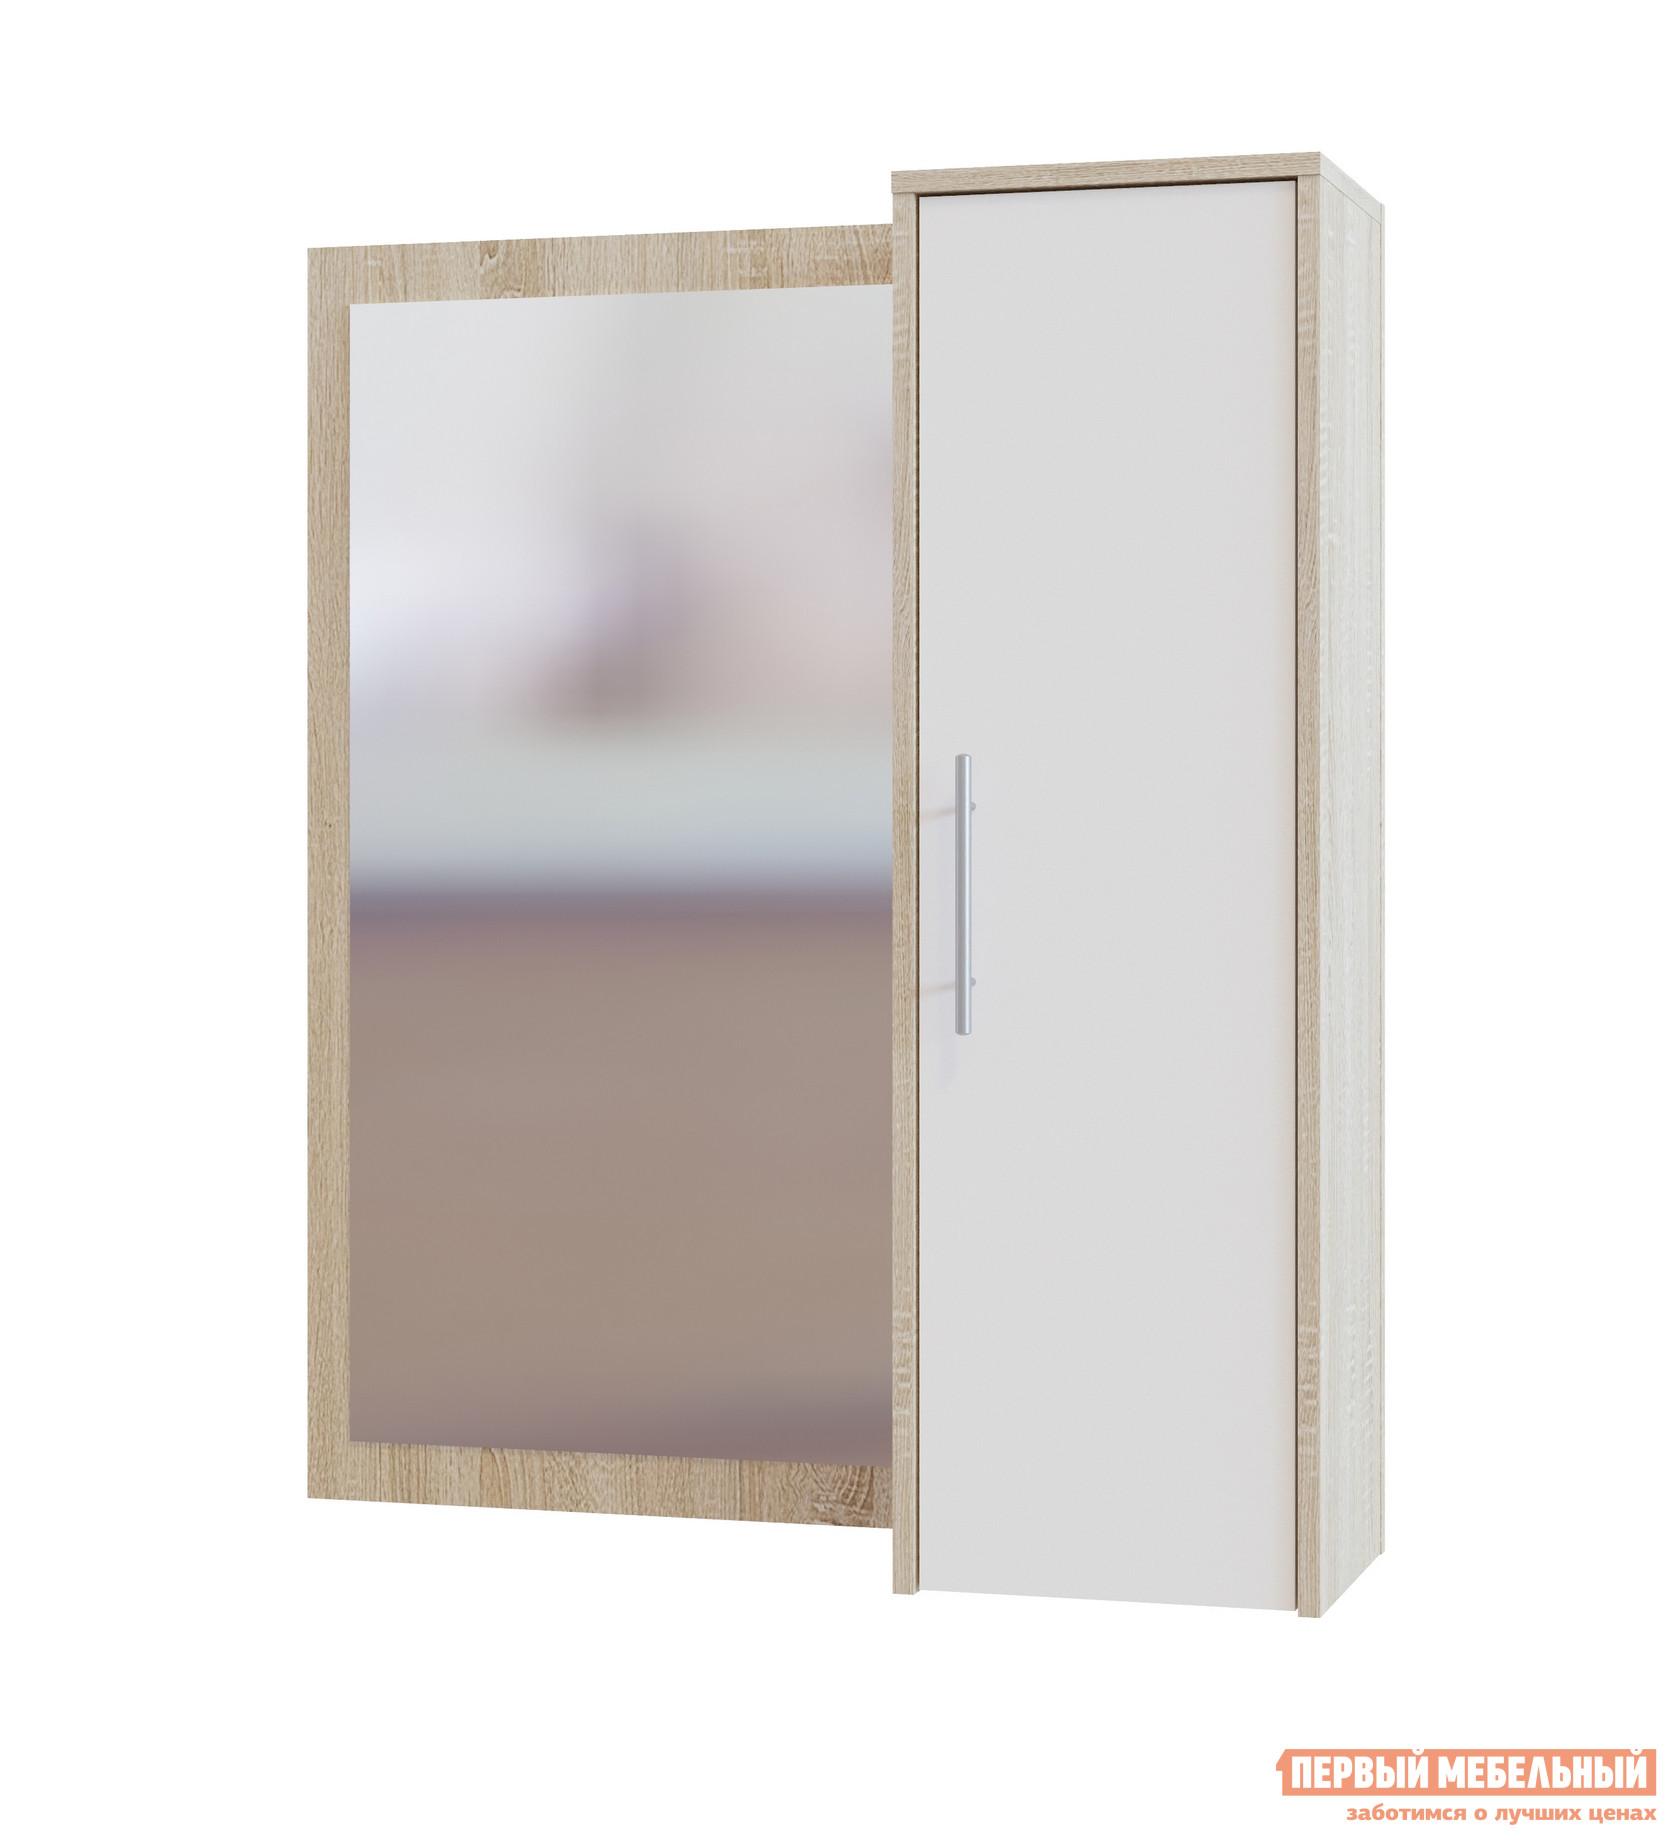 Настенное зеркало Сокол ПЗ-4 Дуб Сонома / Белый